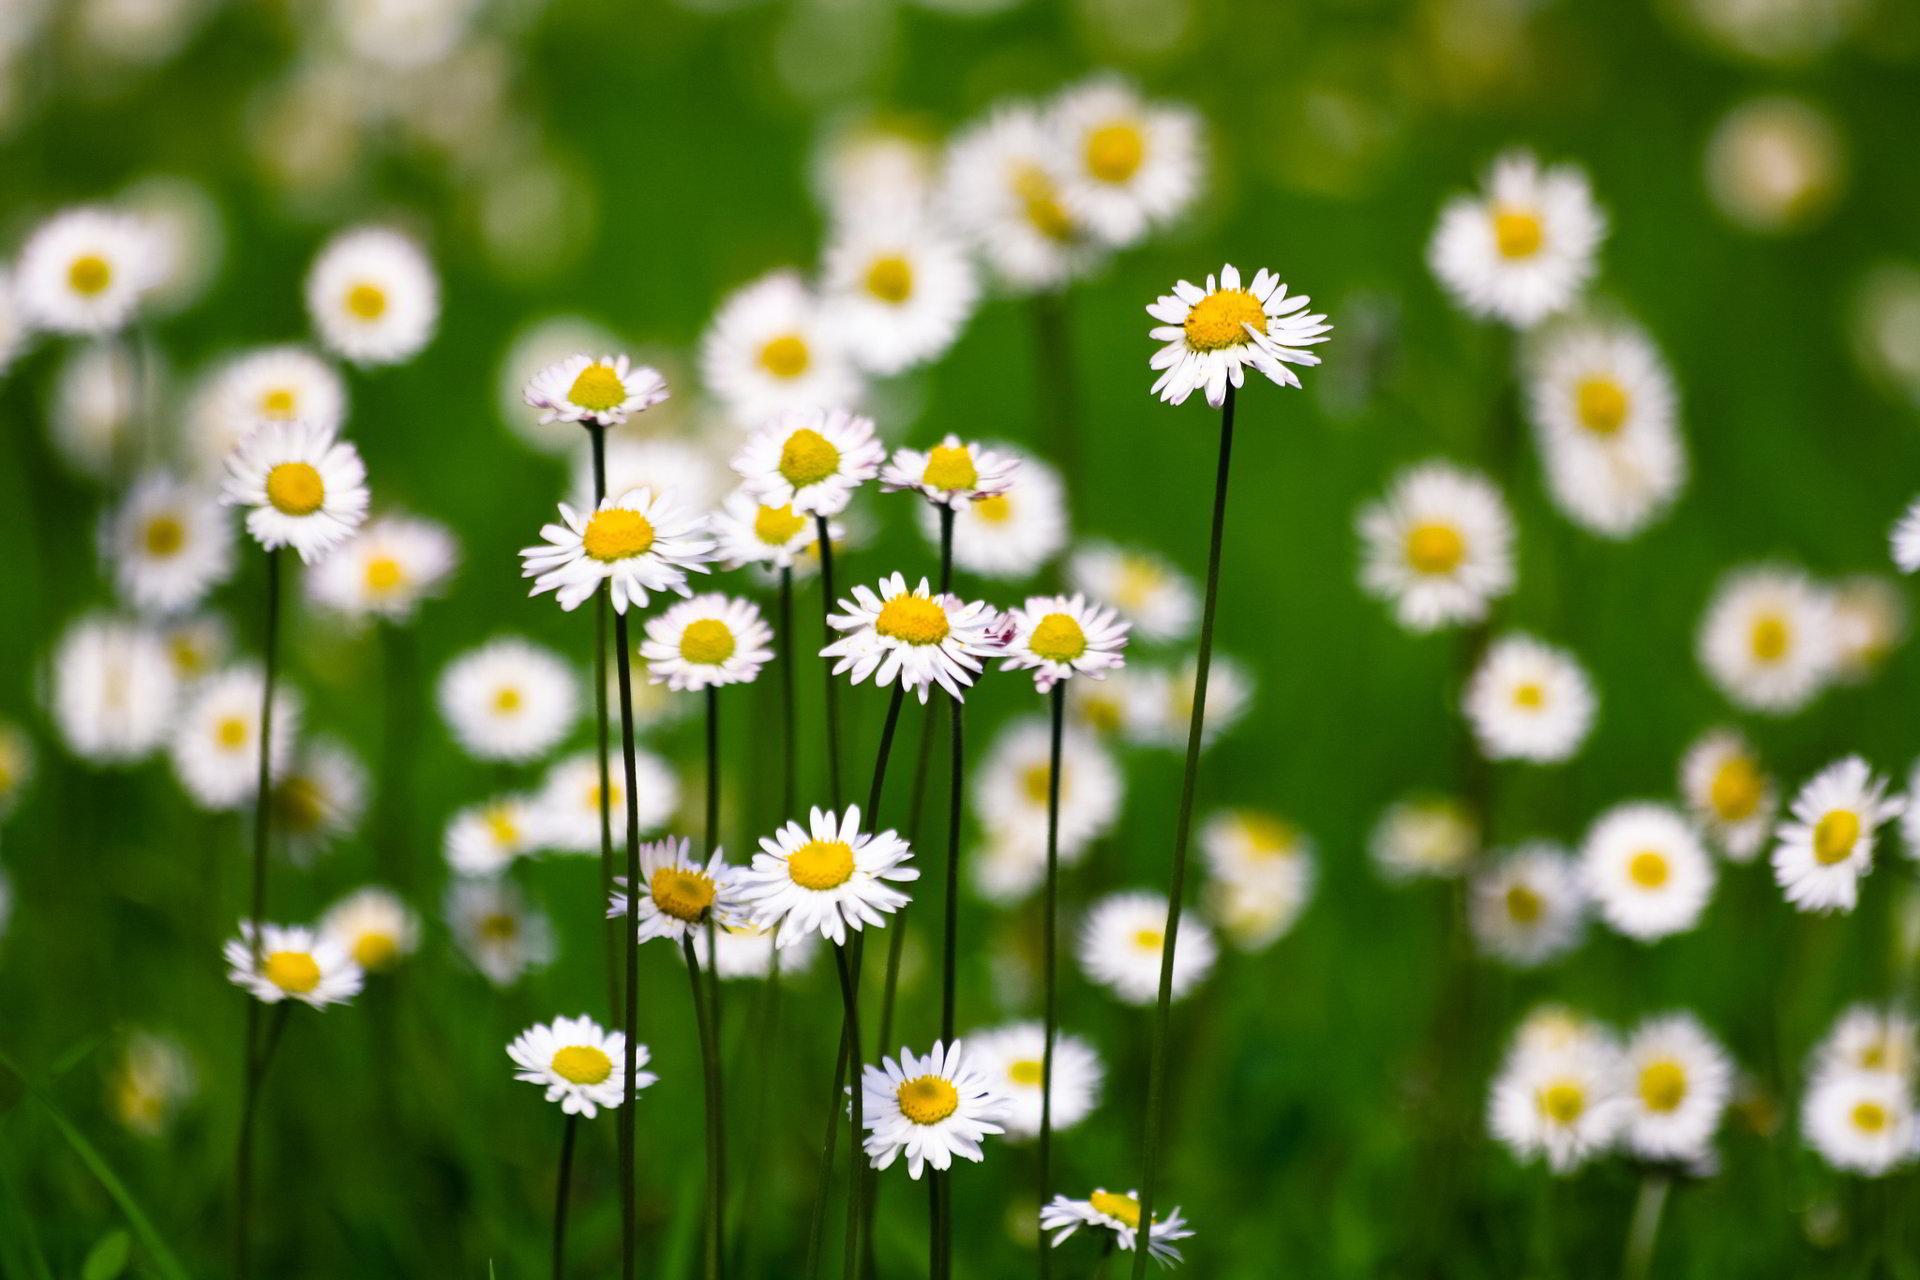 hinh anh hoa cuc dep 18